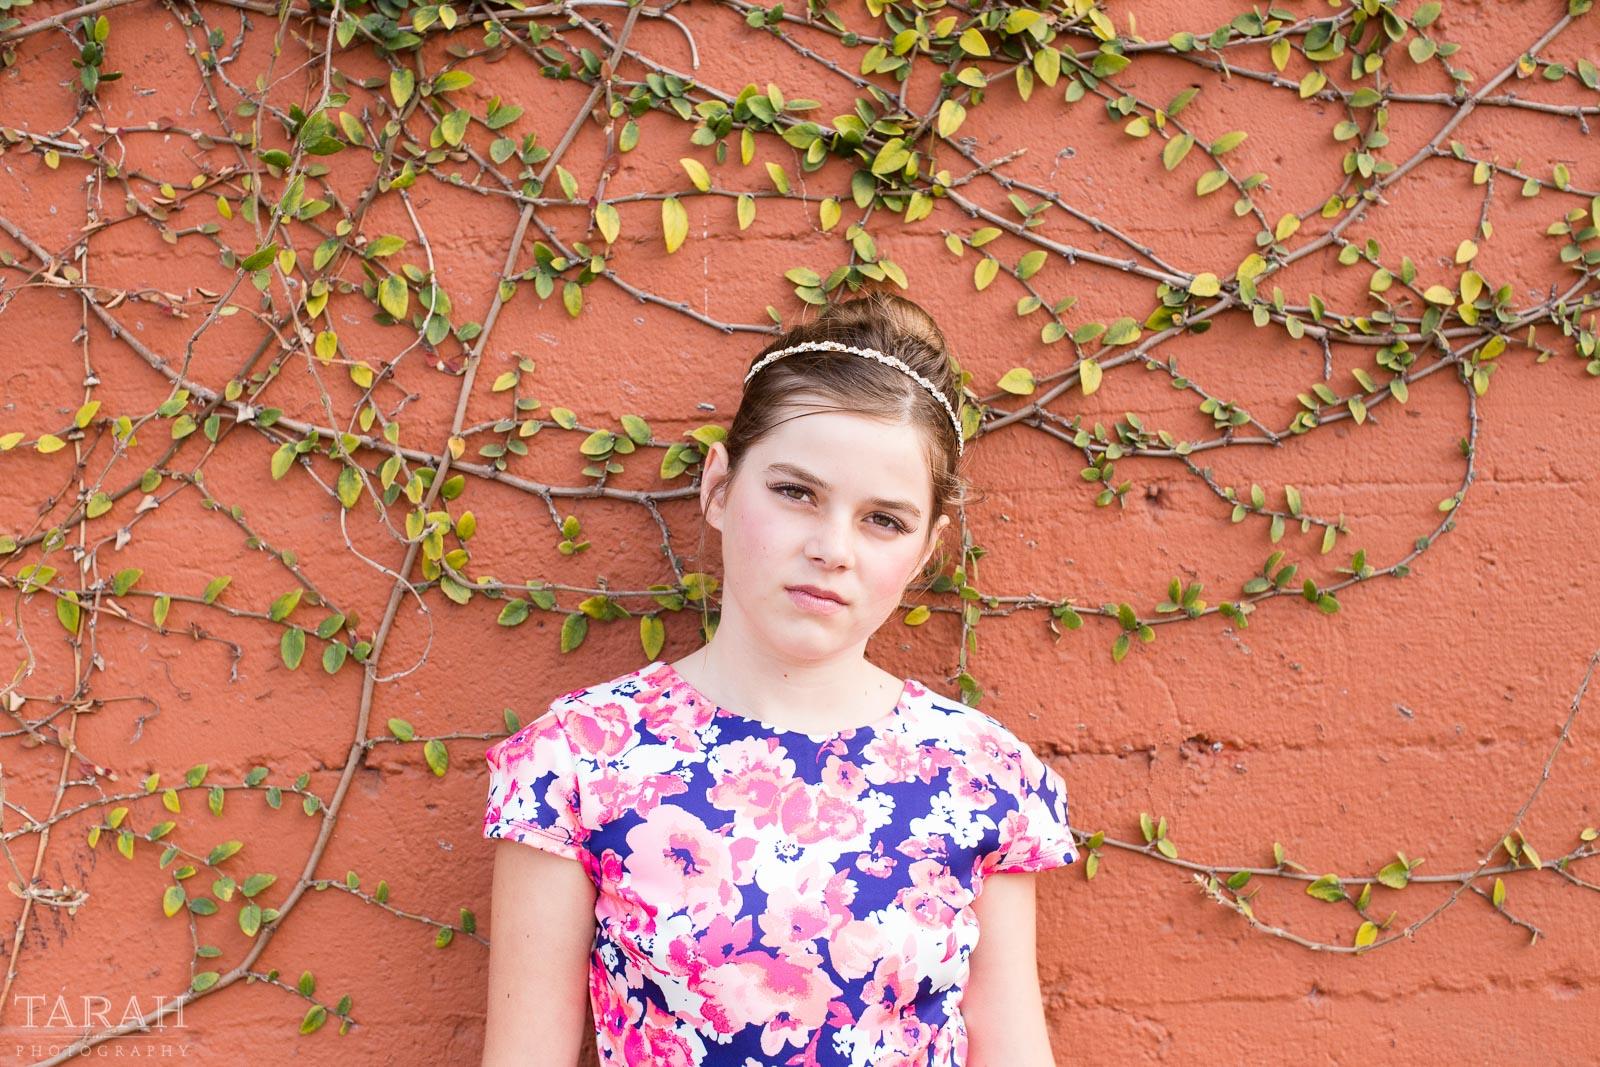 tween portrait against a wall by Tarah Beaven